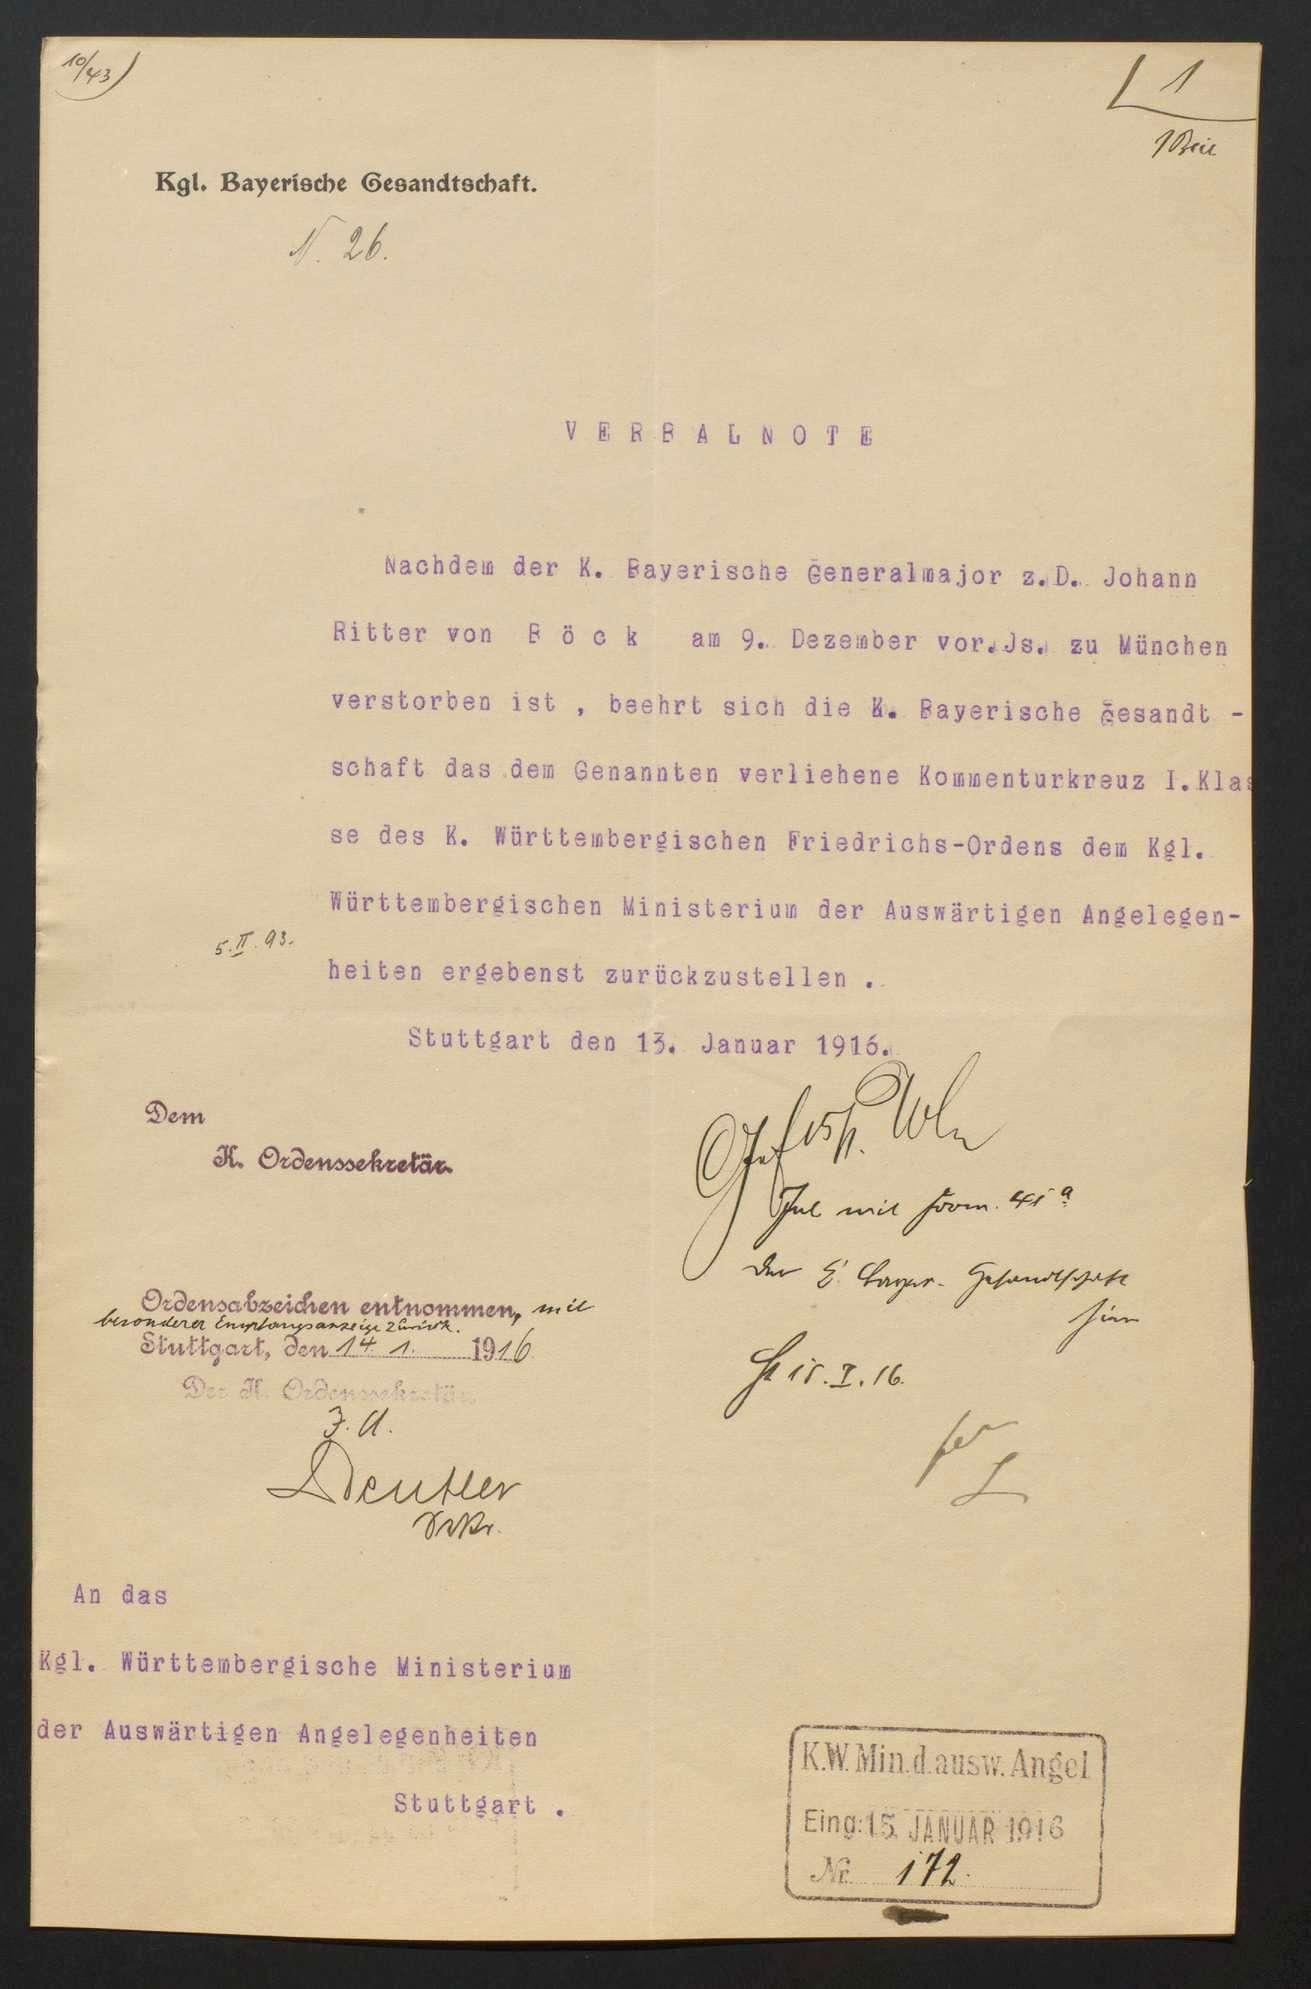 Rückgabe württembergischer Orden, Bild 2